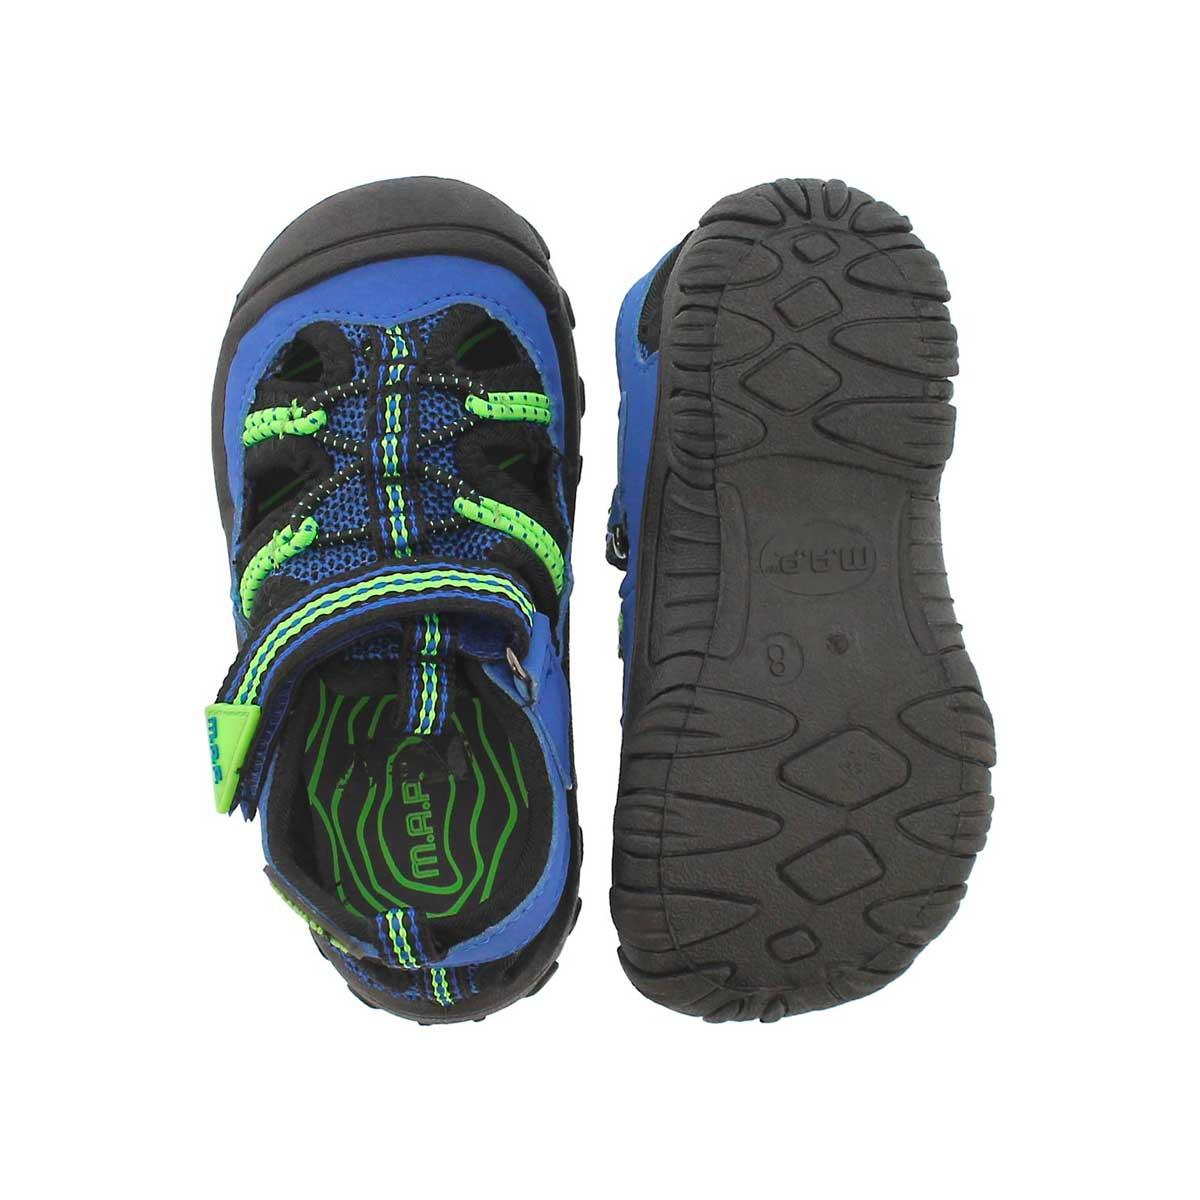 Inf-b Emmons blk/blu fisherman sandal